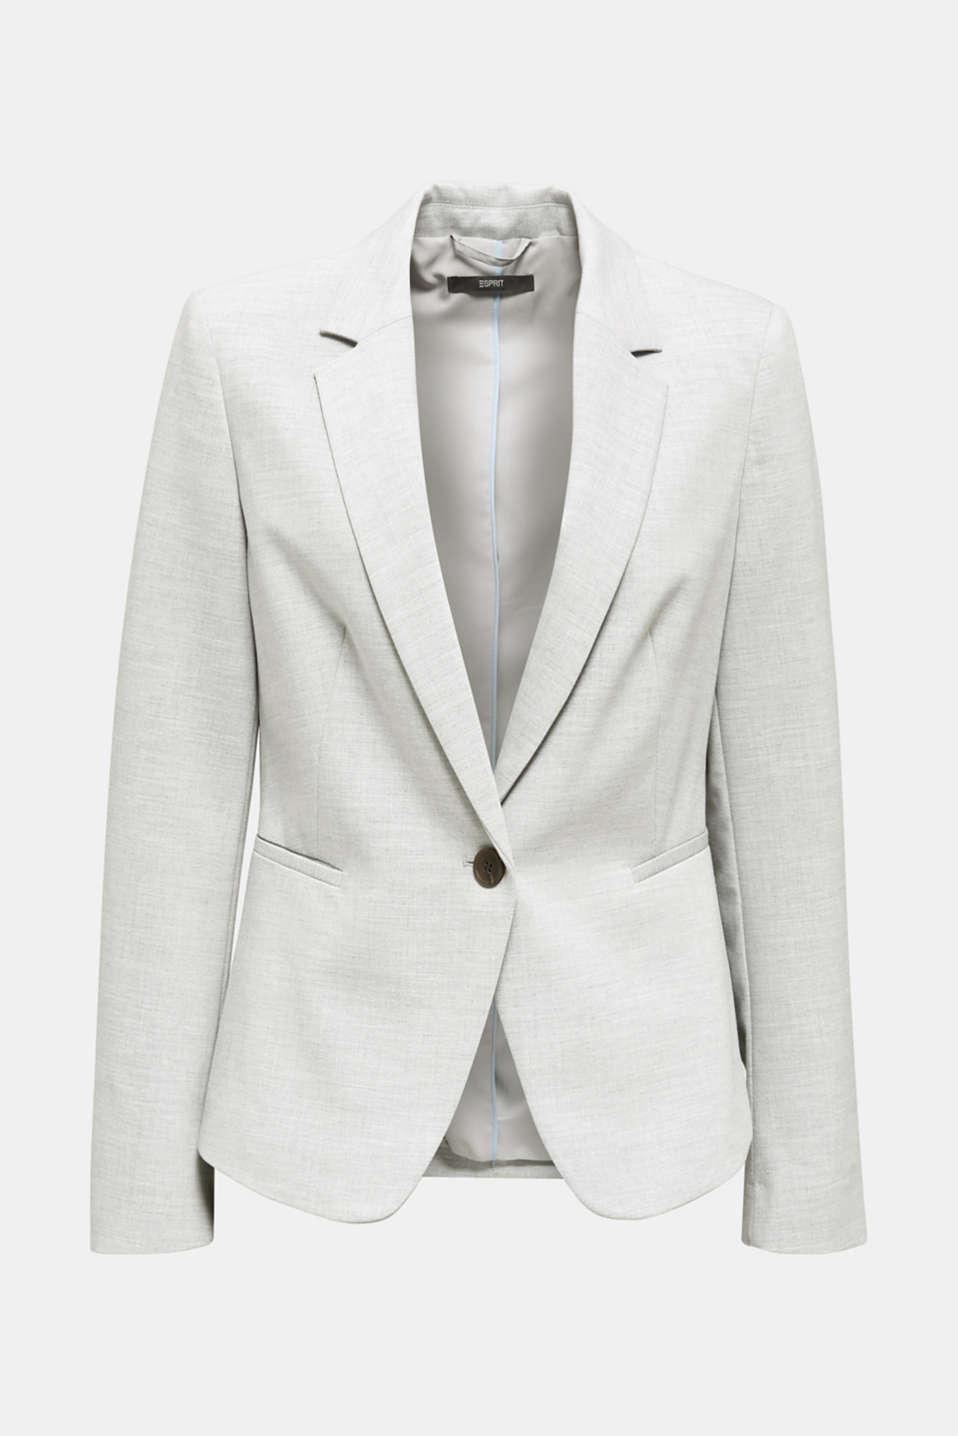 SUMMER BIZ mix + match stretch blazer, LIGHT GREY 5, detail image number 6